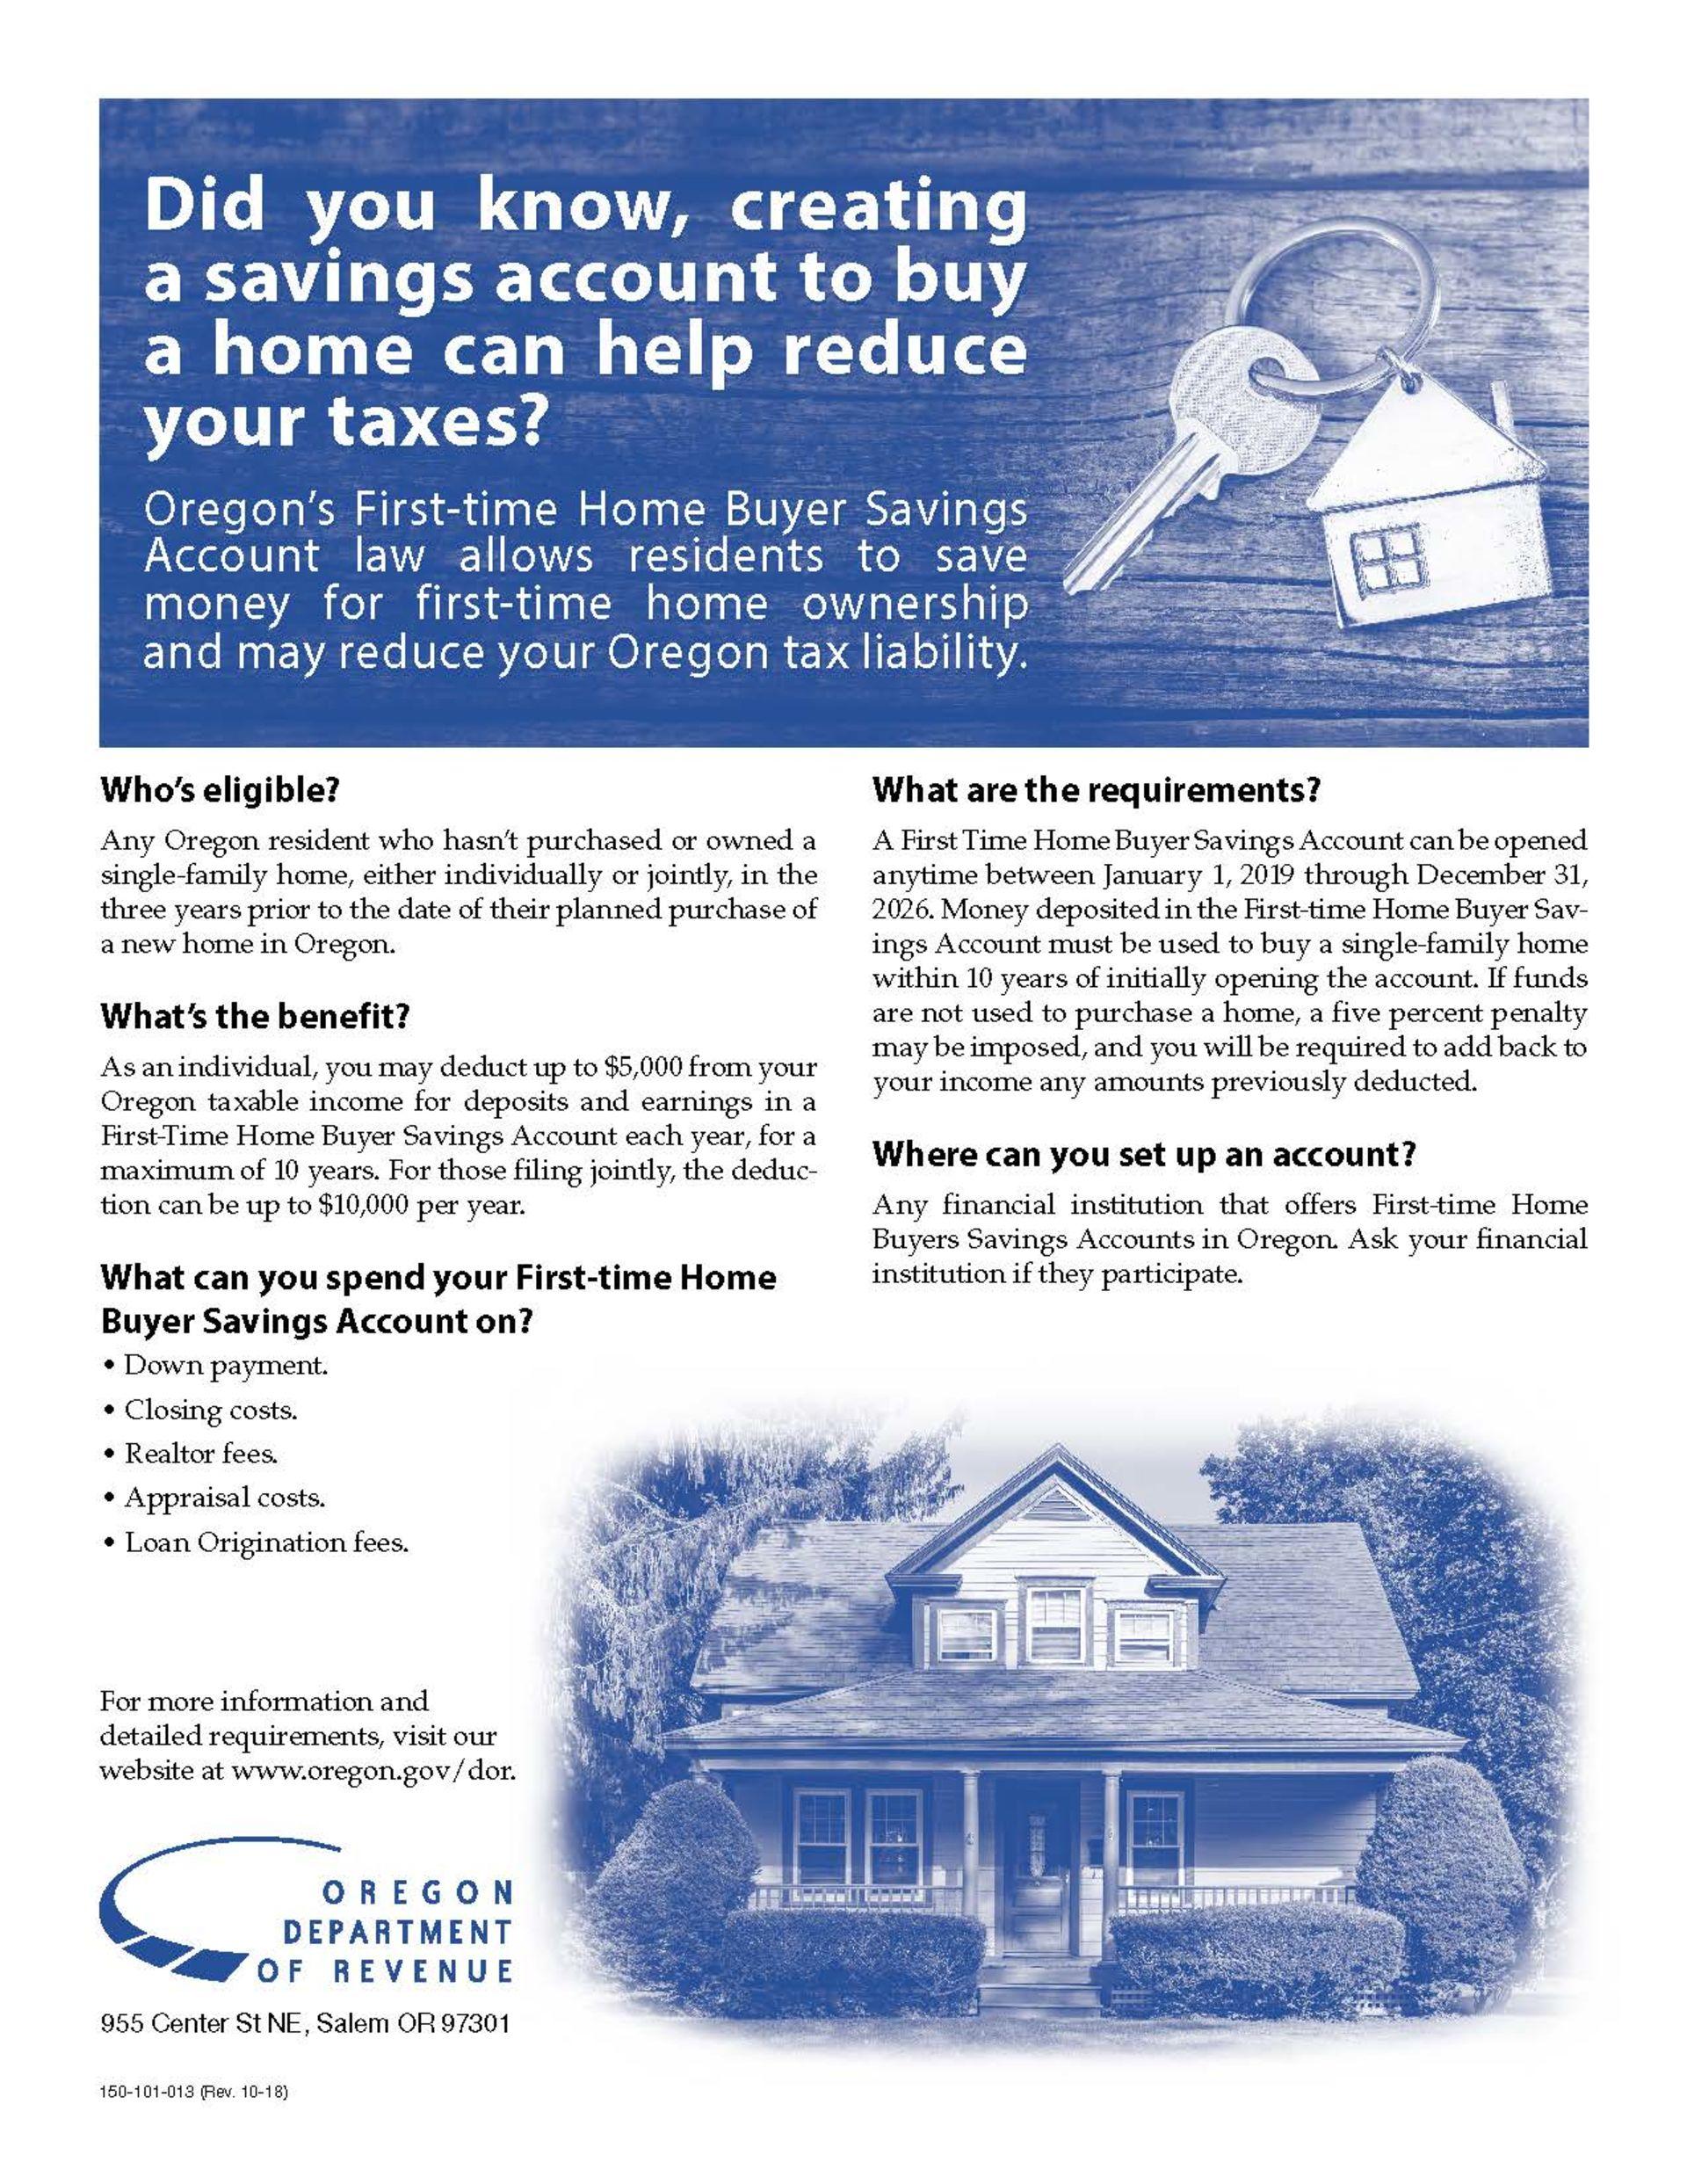 Oregon First Time Home Buyers Savings Accounts